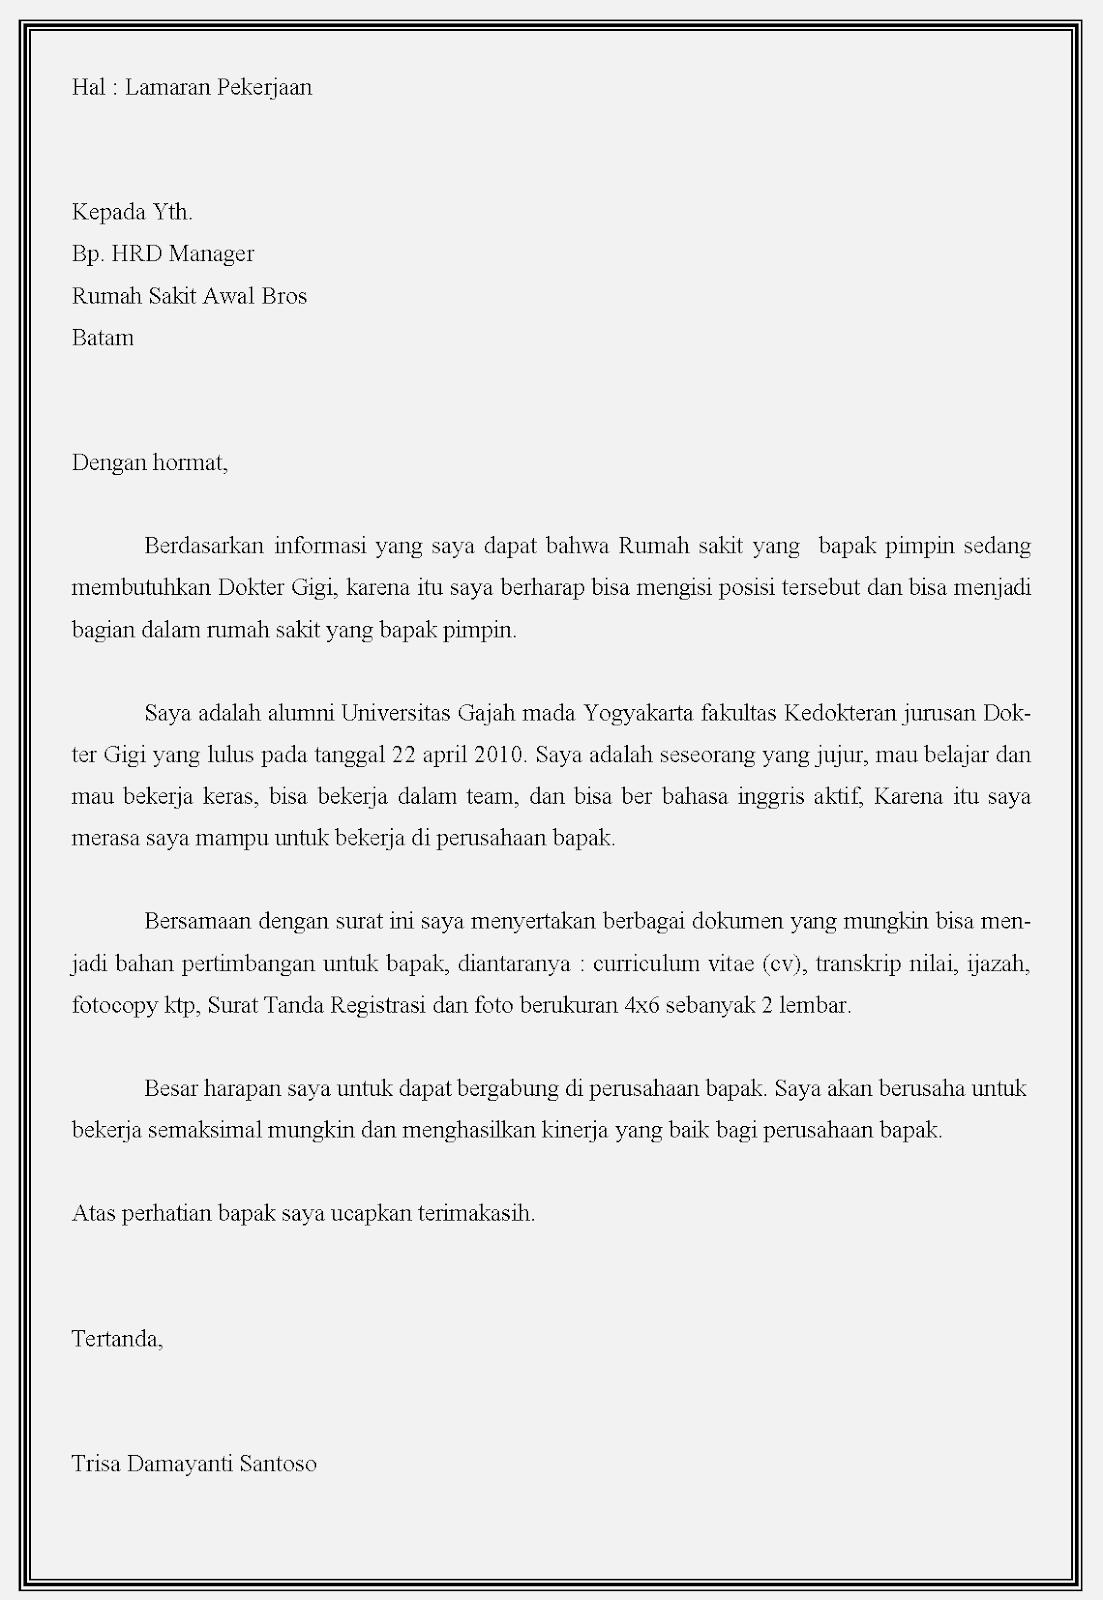 Contoh surat lamaran kerja dokter rumah sakit swasta